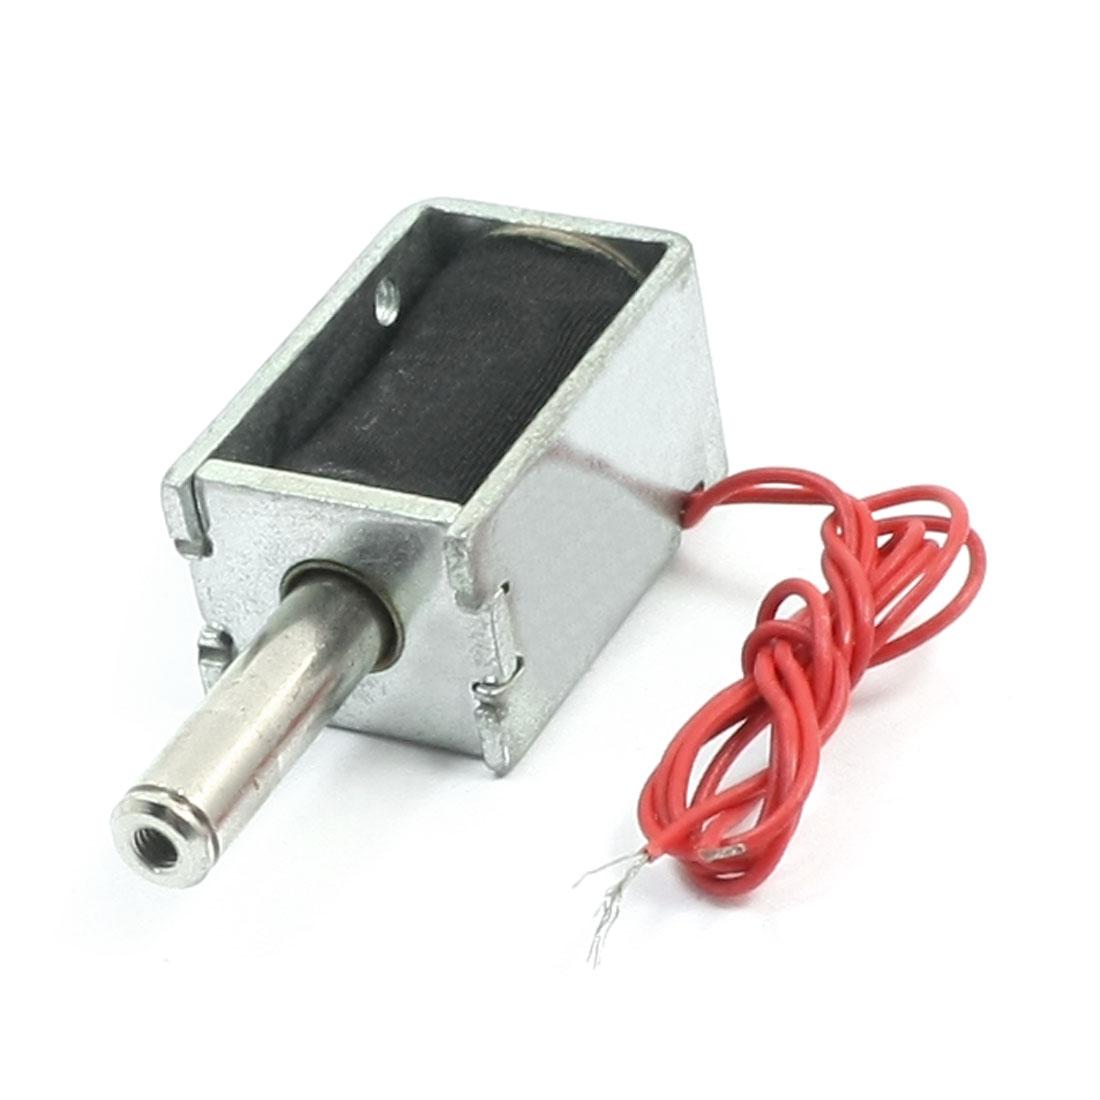 DC48V 0.25A 12W 80g/5mm Pull Type Open Frame Solenoid Electromagnet